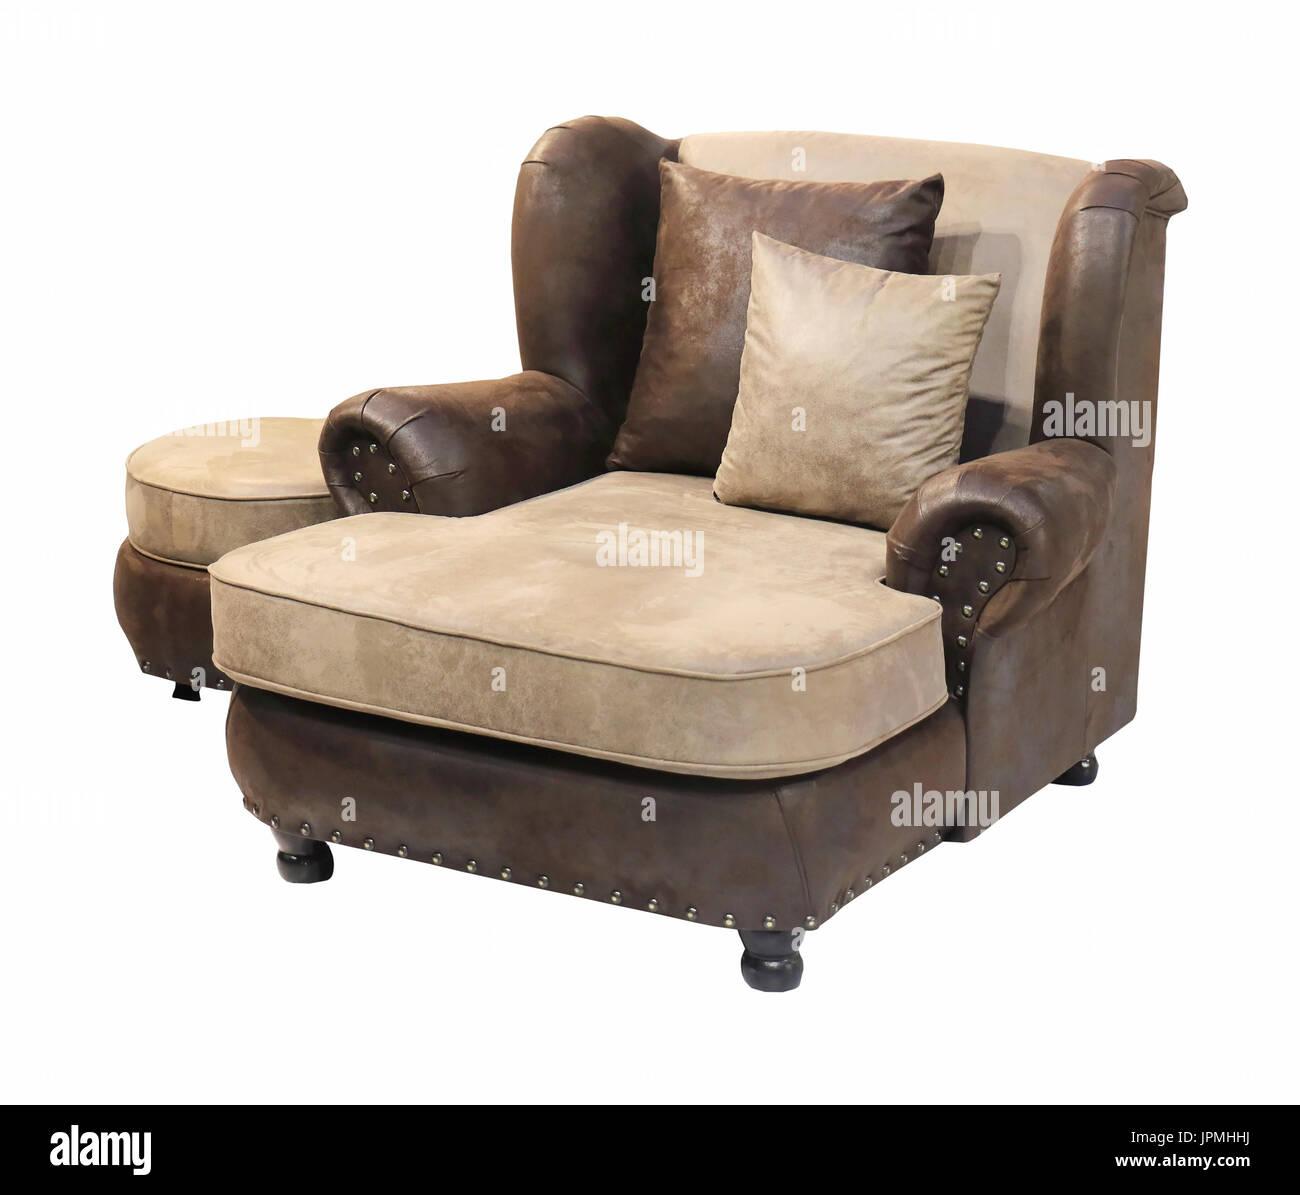 Ottoman Furniture Imágenes De Stock & Ottoman Furniture Fotos De ...